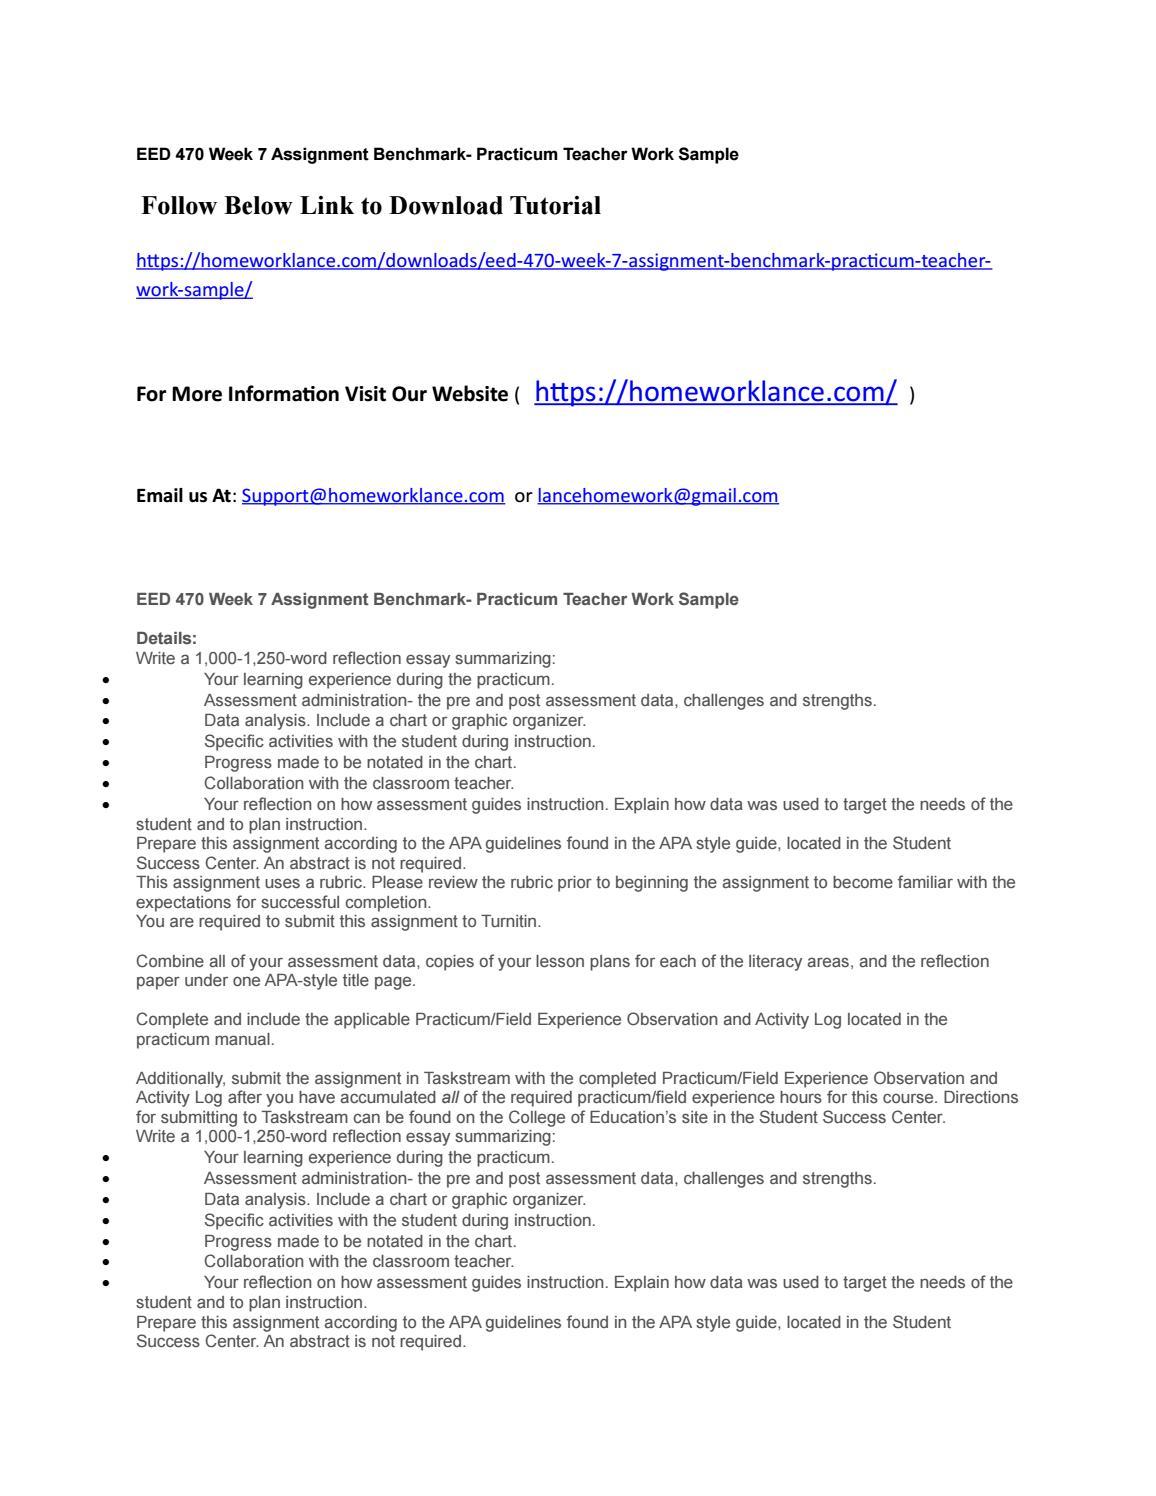 Practicum reflection paper | Term paper Example